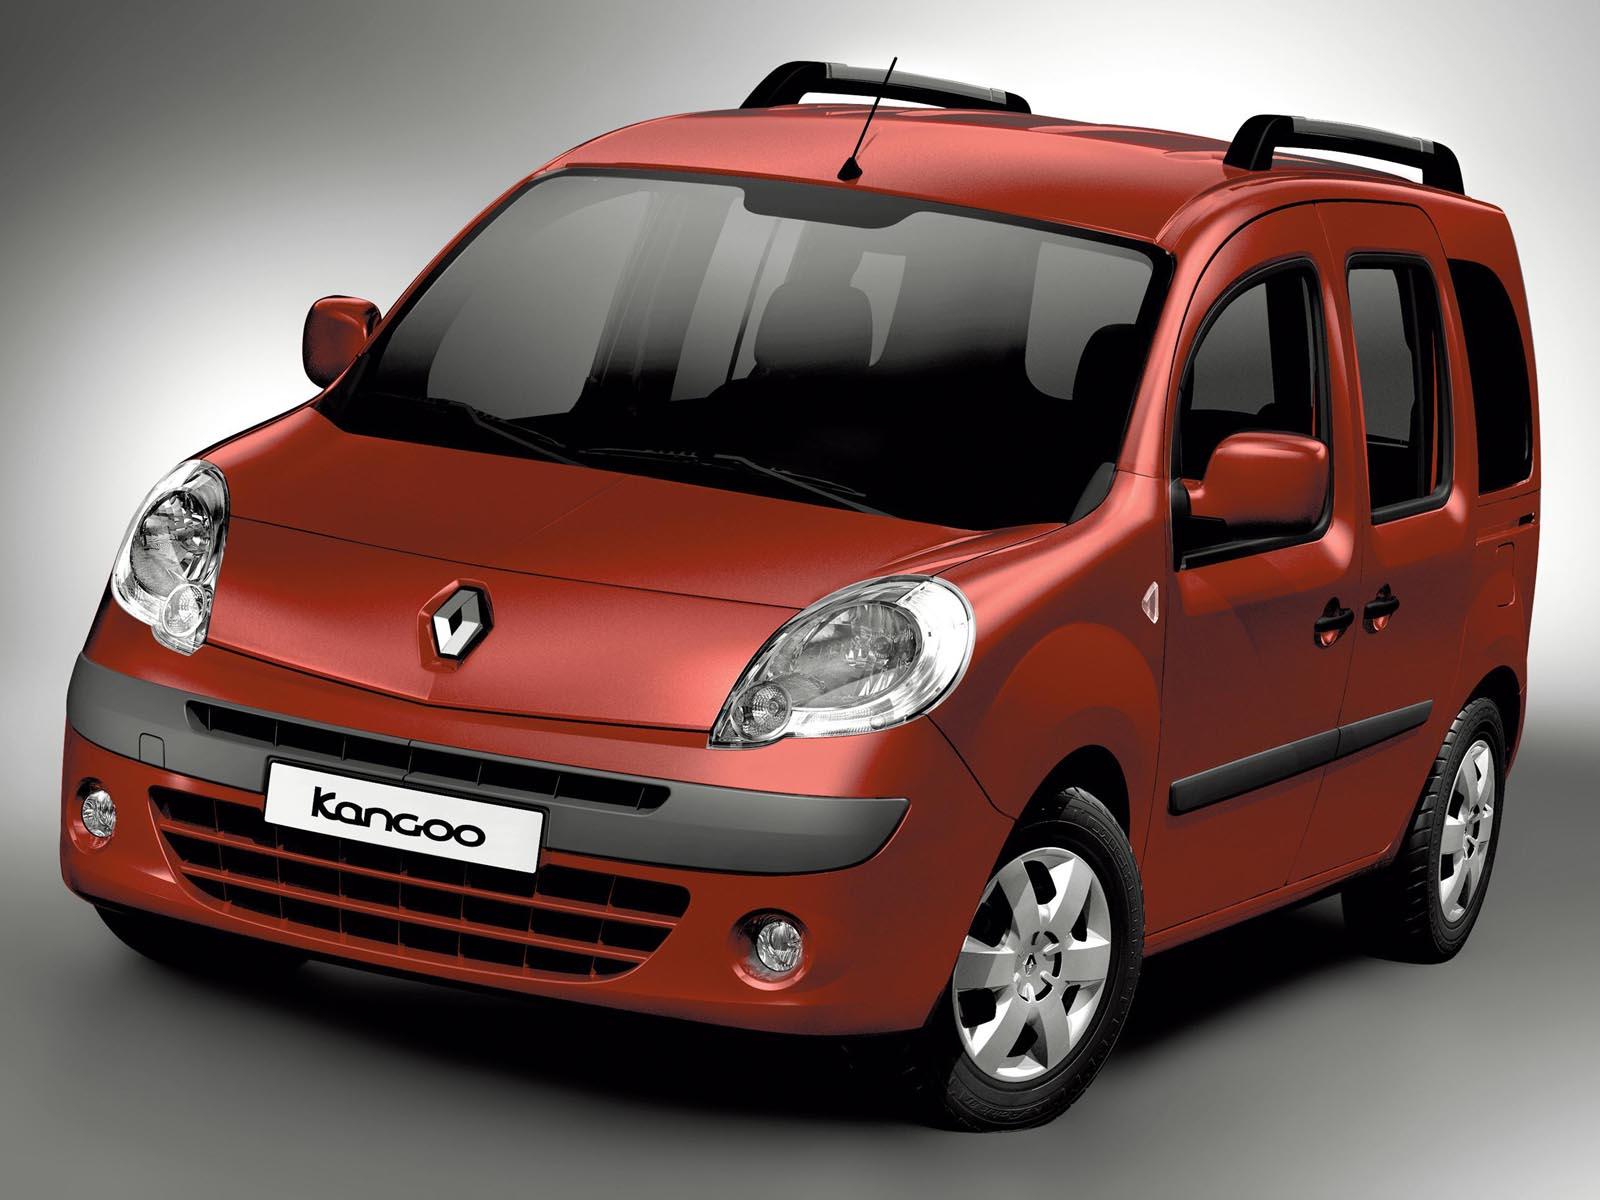 Фотографии Renault Kangoo.